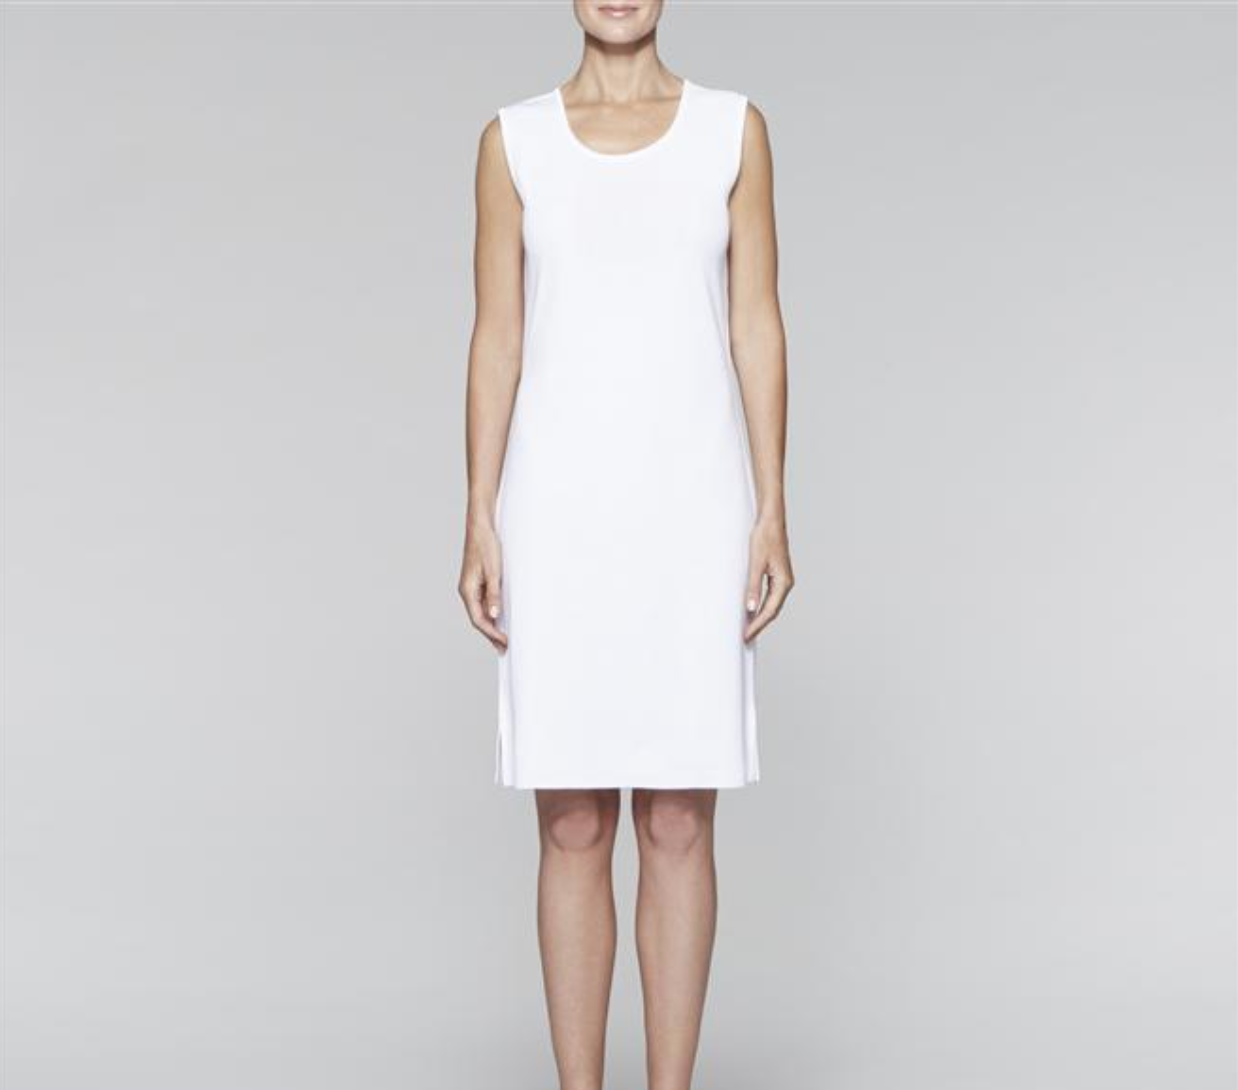 "<a href=""http://www.misook.com/item/kd02/201301/sleeveless-sheath-dress?utm_source=gcfam&utm_medium=TK&utm_campaign=MSK7591"" rel=""nofollow"">Sleeveless Sheath Dress</a>"